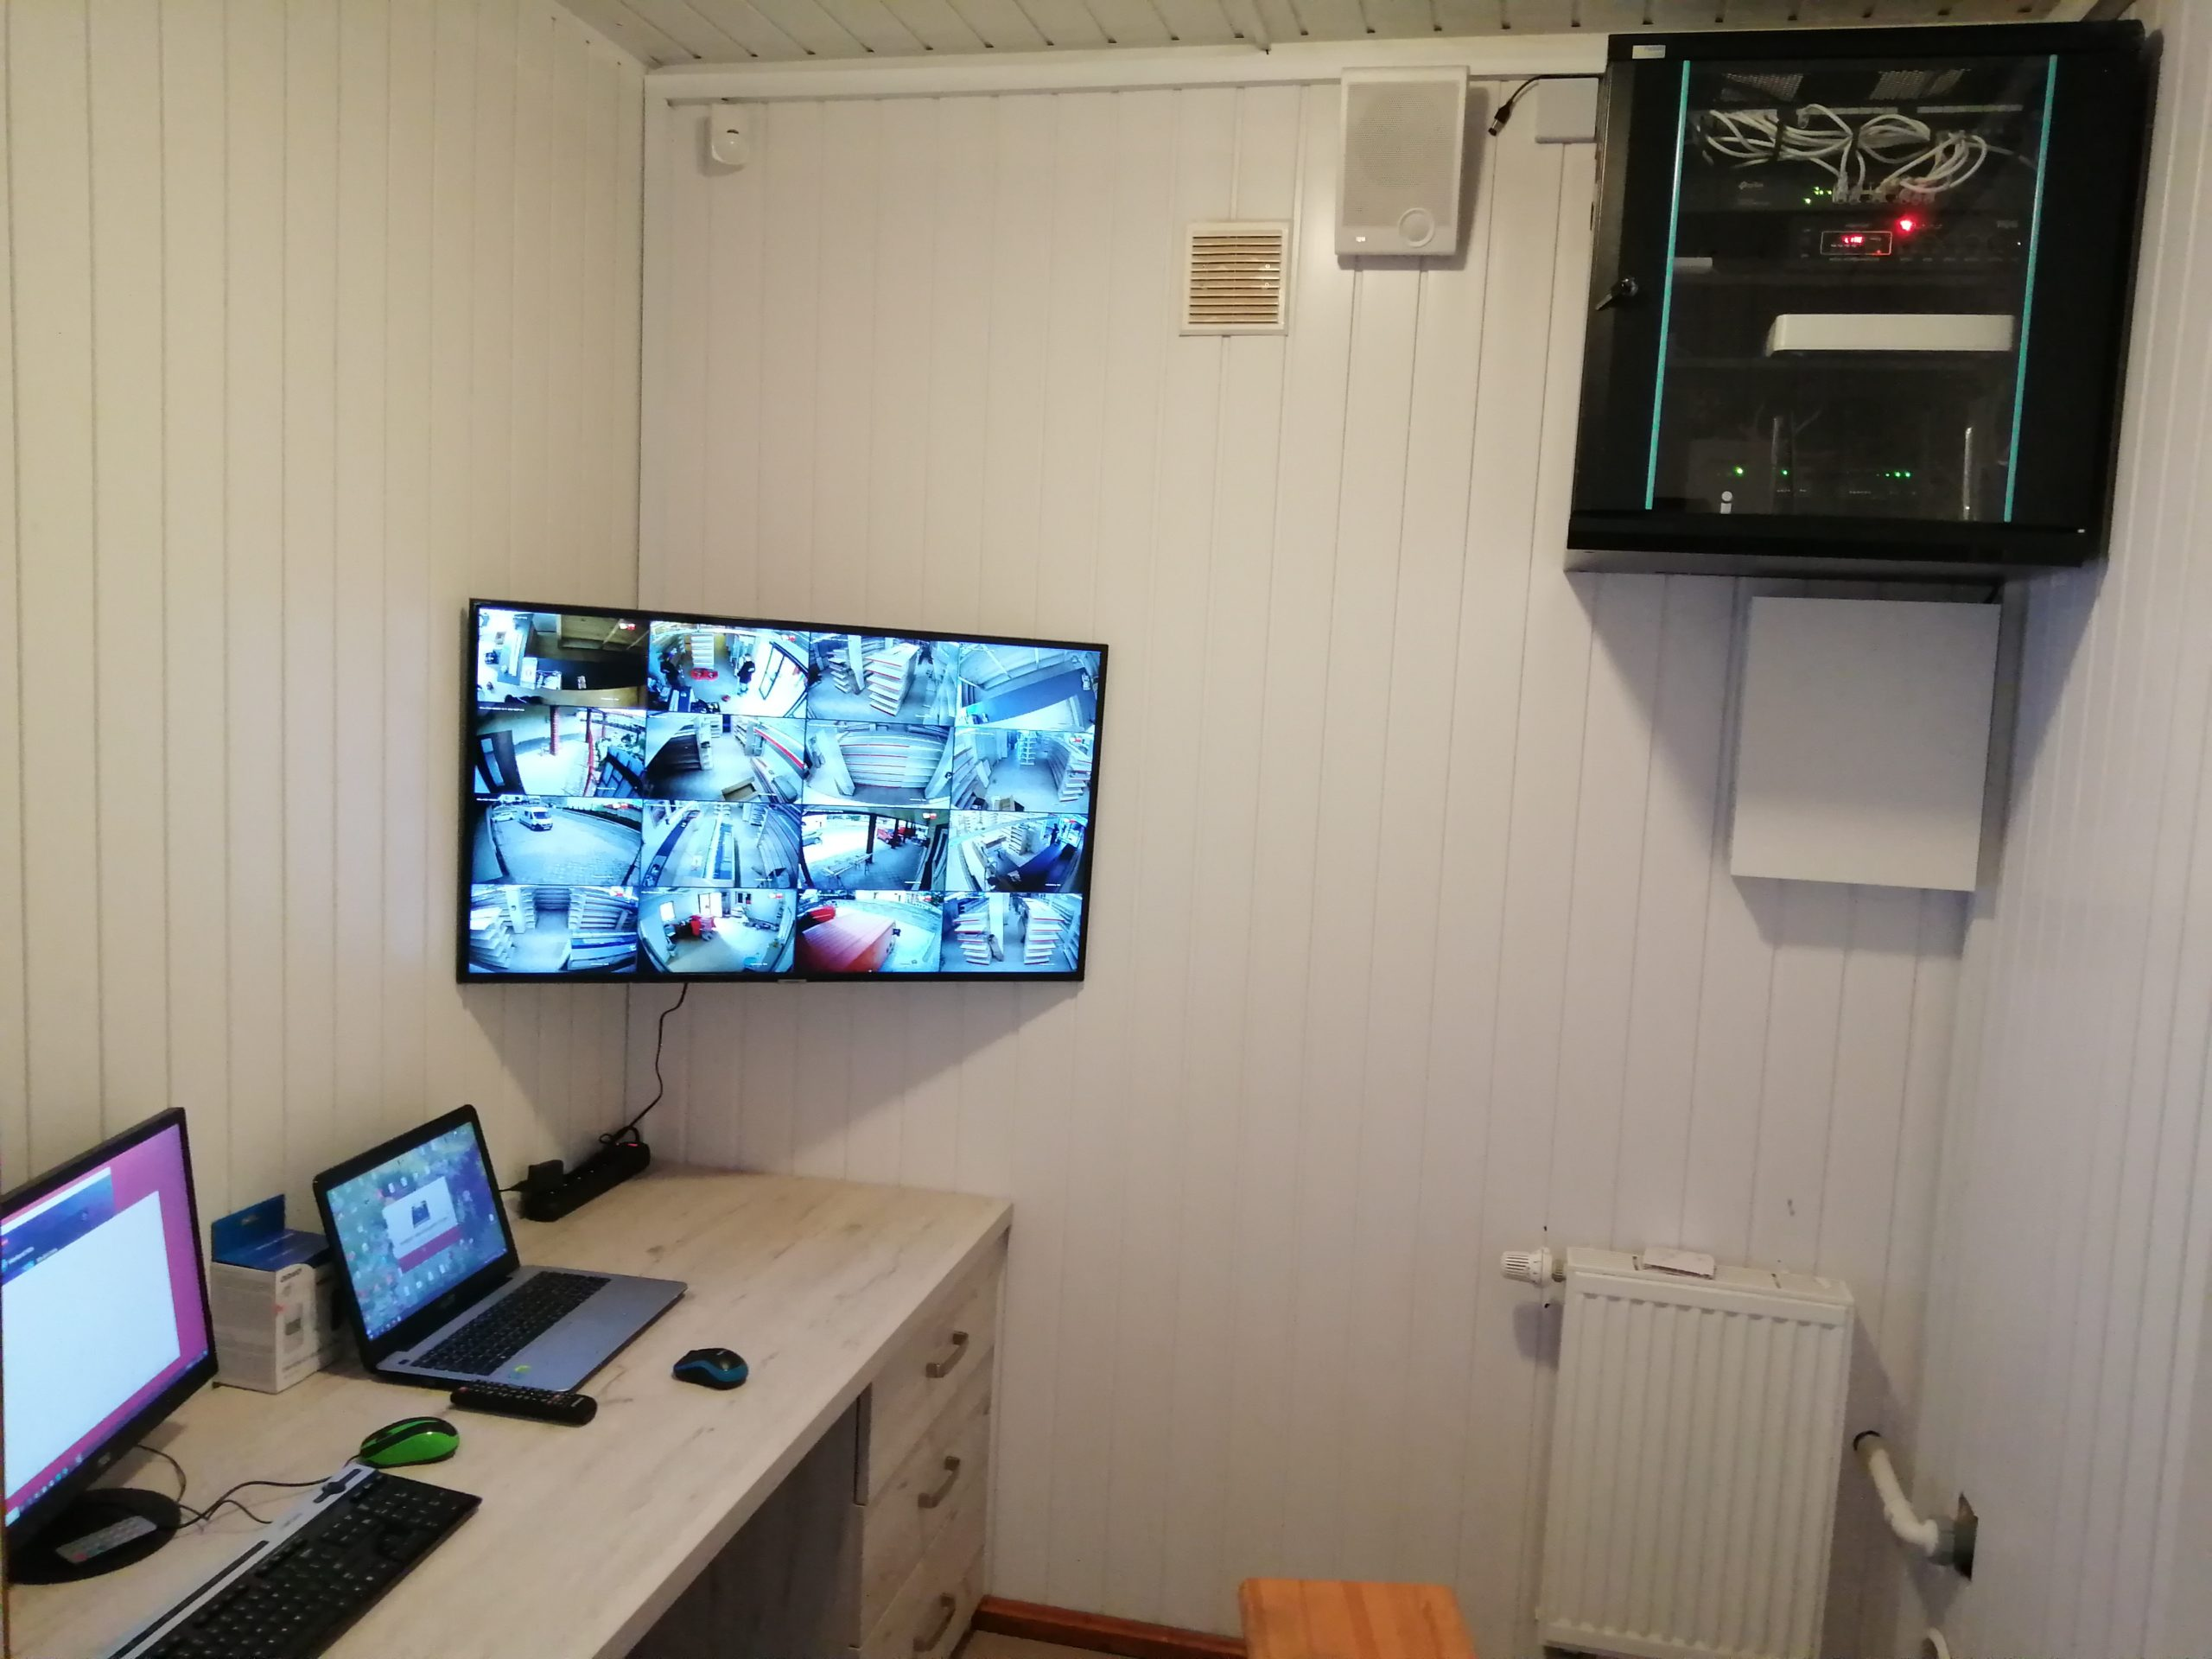 monitoring stalowa wola klimatyzacja stalowa wola fotowoltaika stalowa wola usługi informatyczne stalowa wola 2